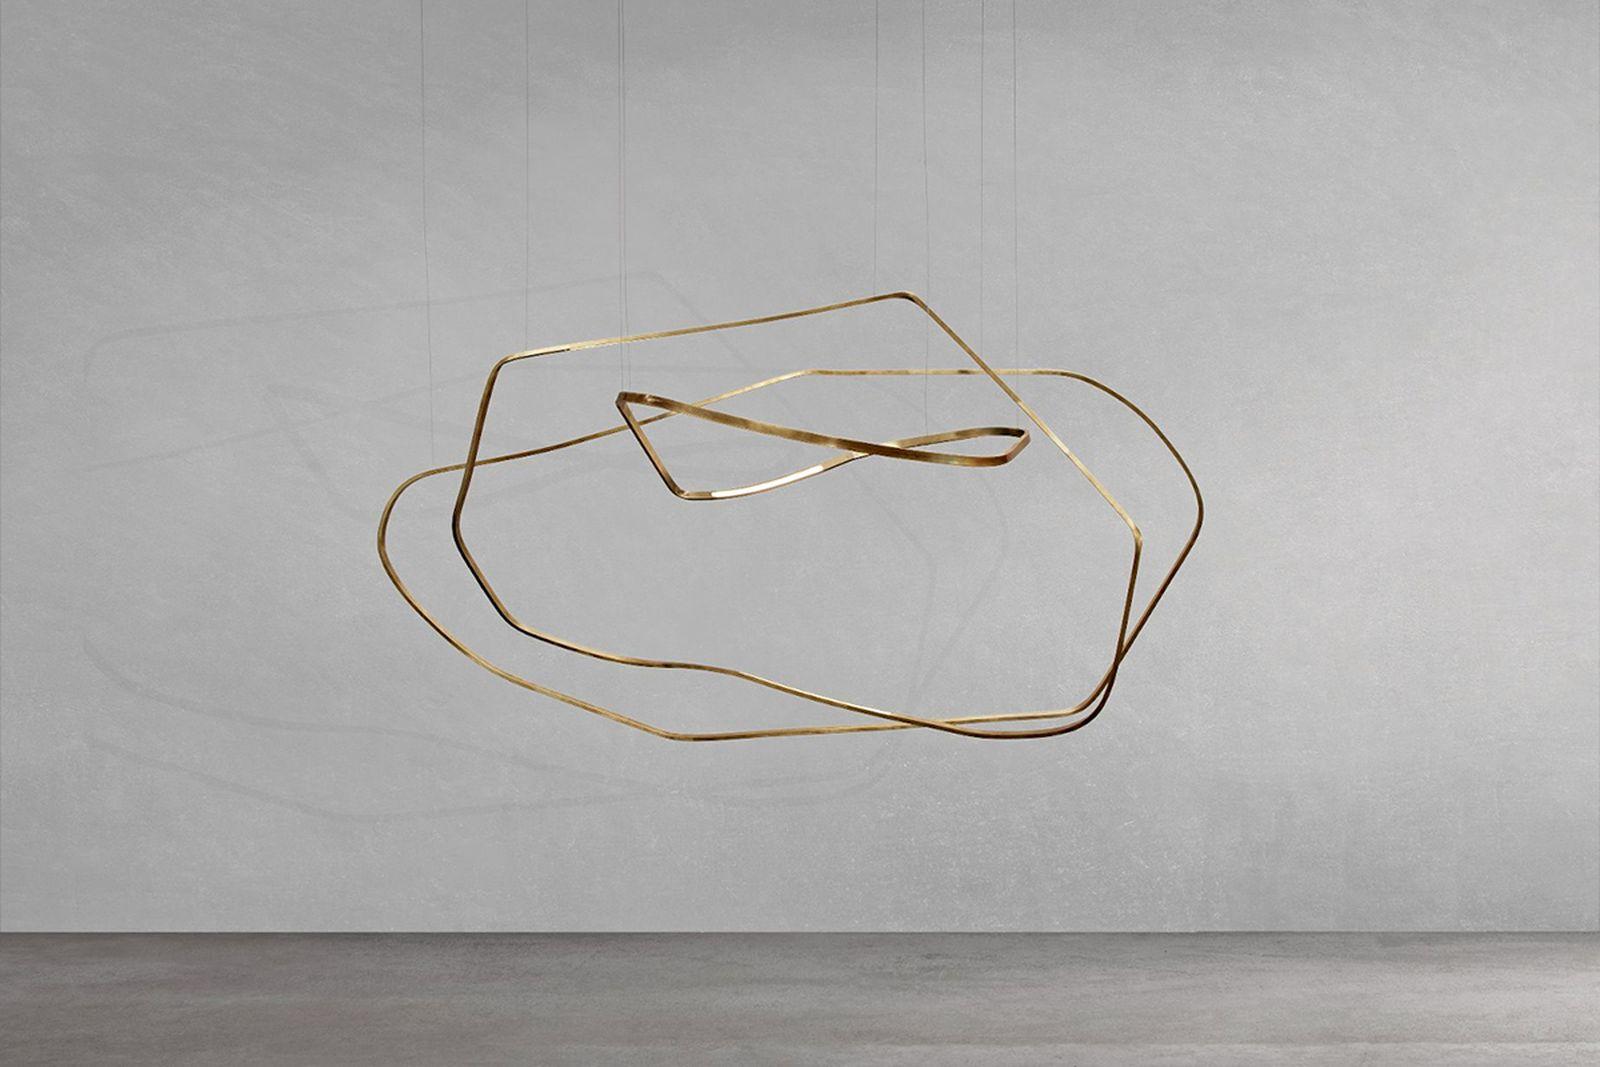 rick-owens-furniture-exhibit (7)